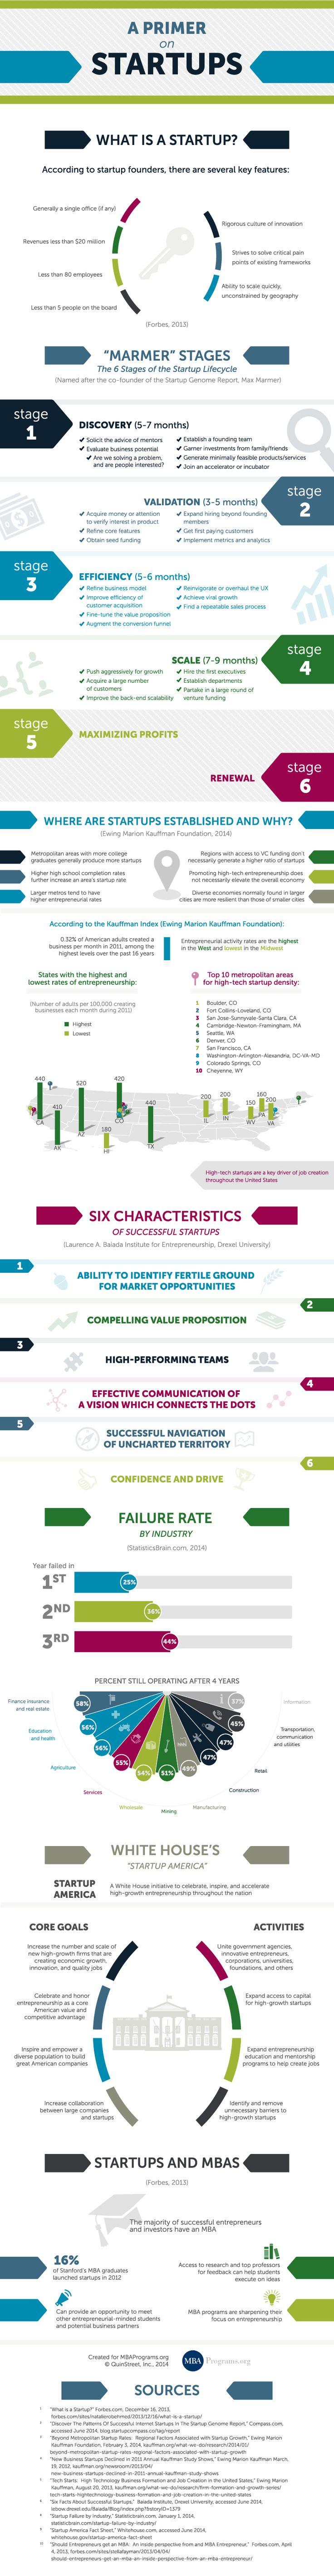 6 Characteristics of Successful Startups